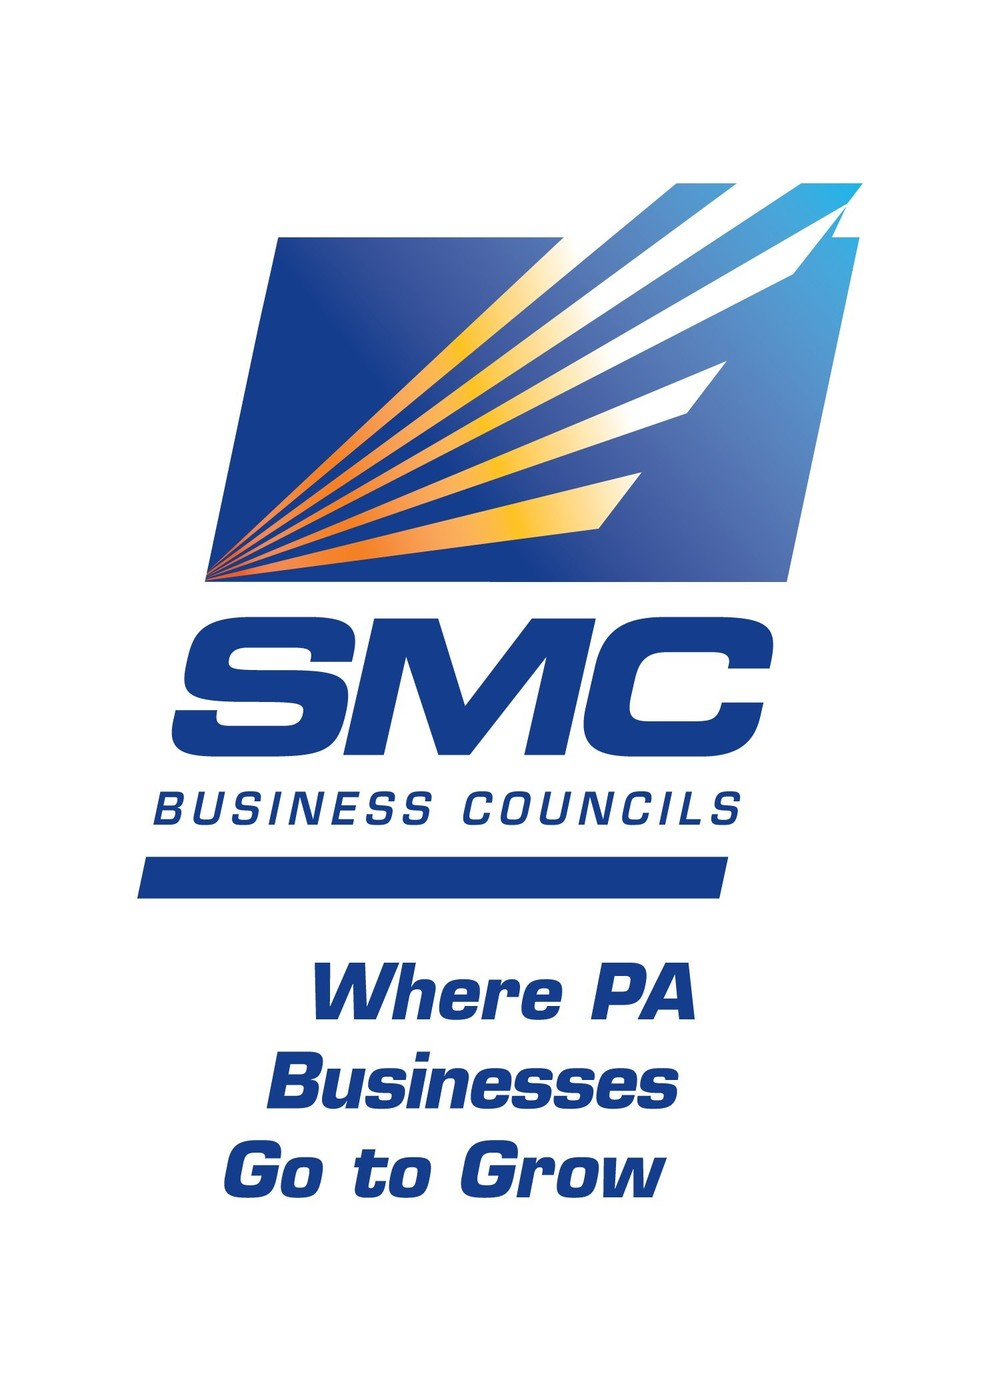 smc-logo1.jpg